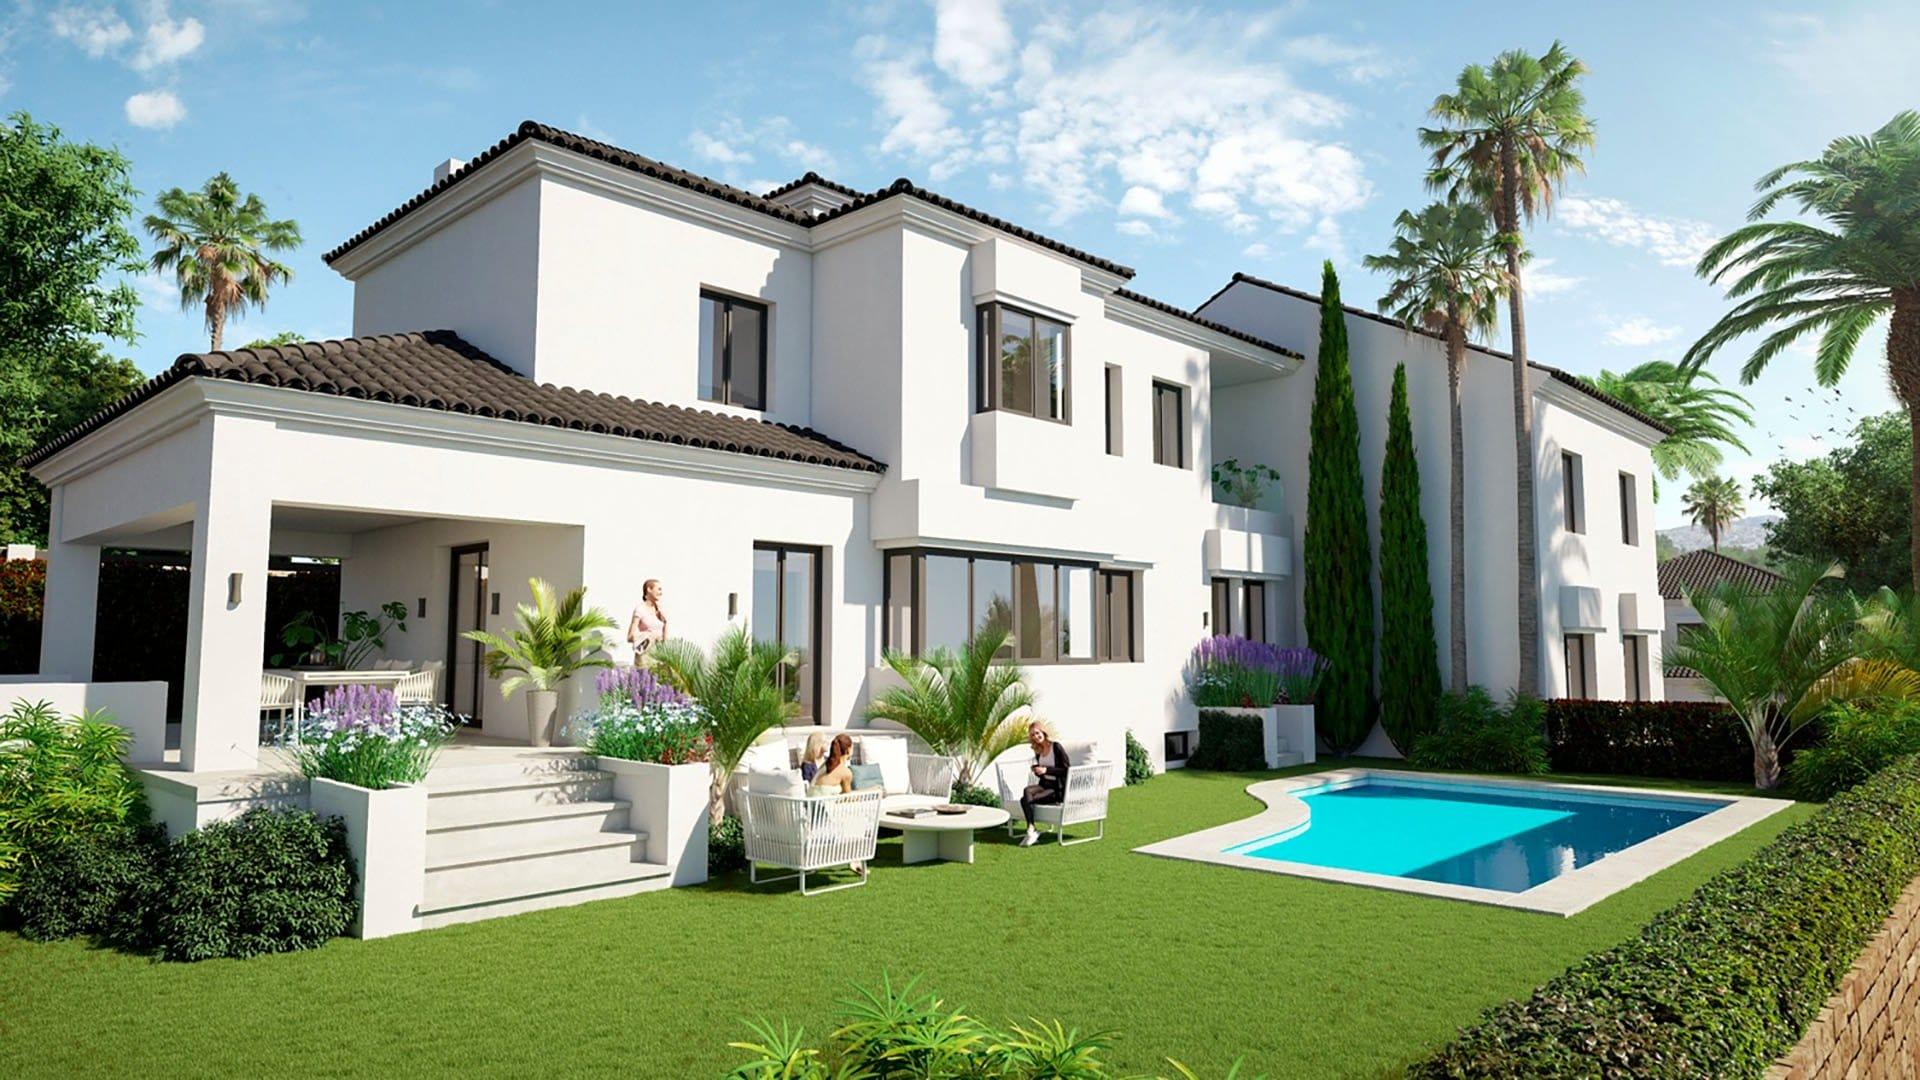 Heaven Marbella: Magnificent villas in Elviria with panoramic views